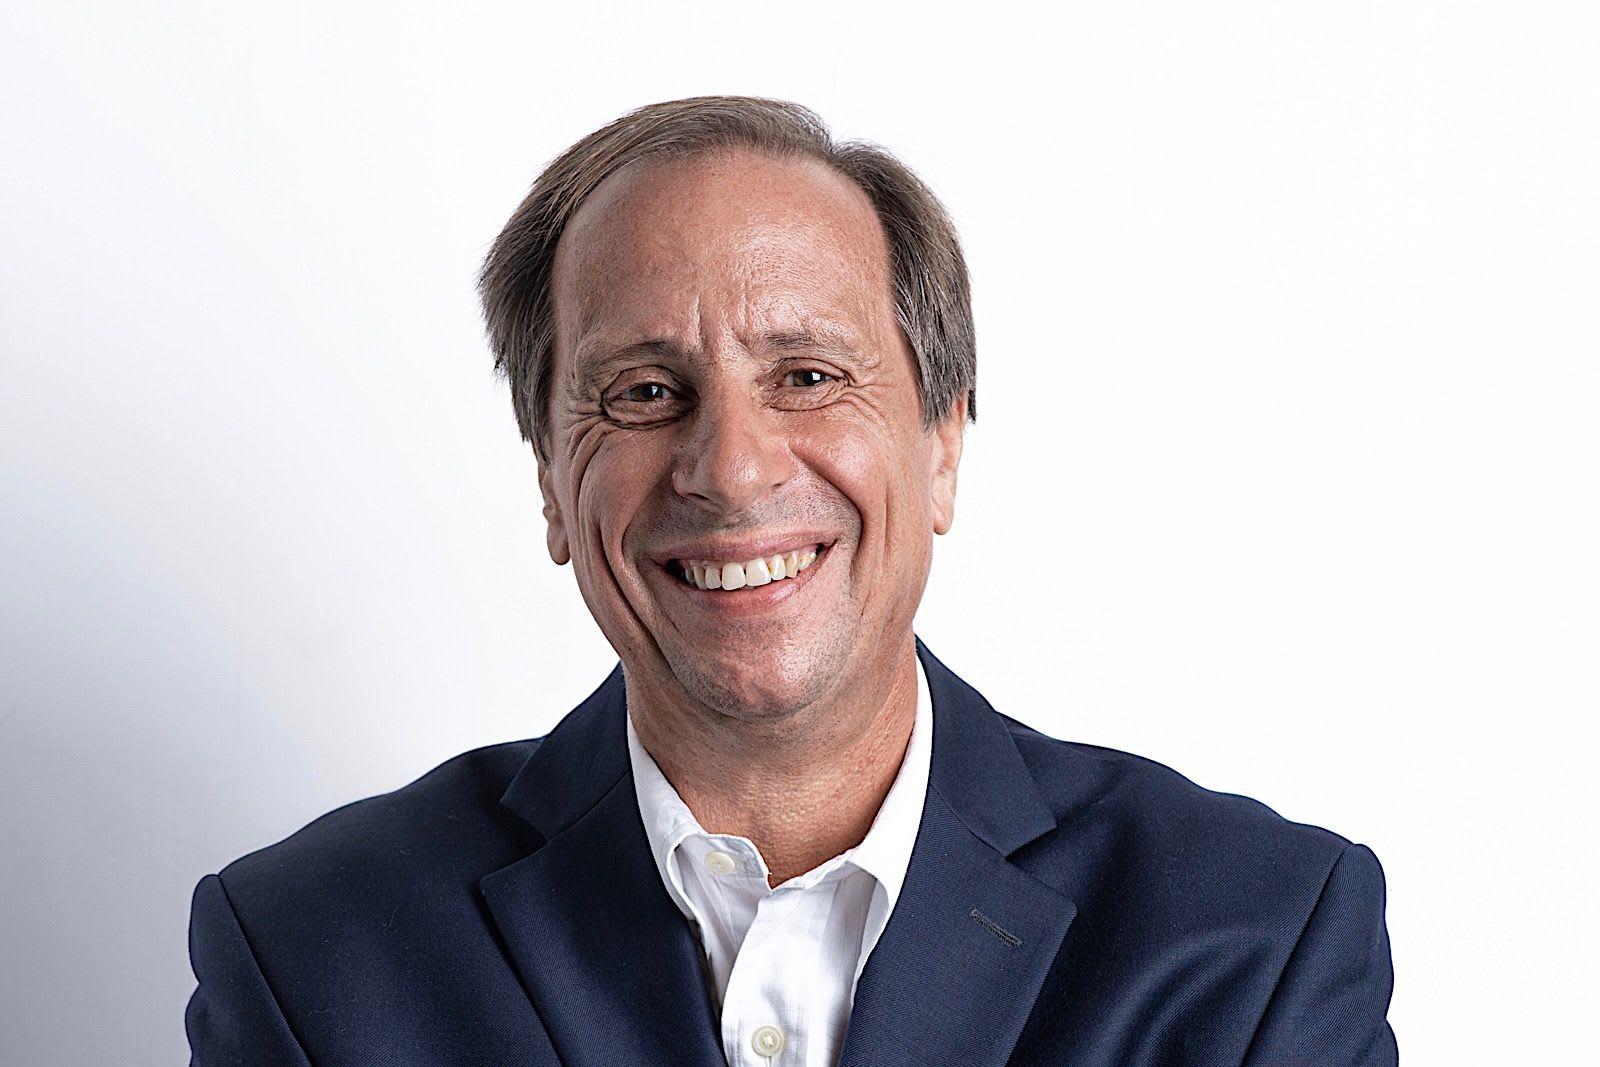 HTC CEO Yves Maitre